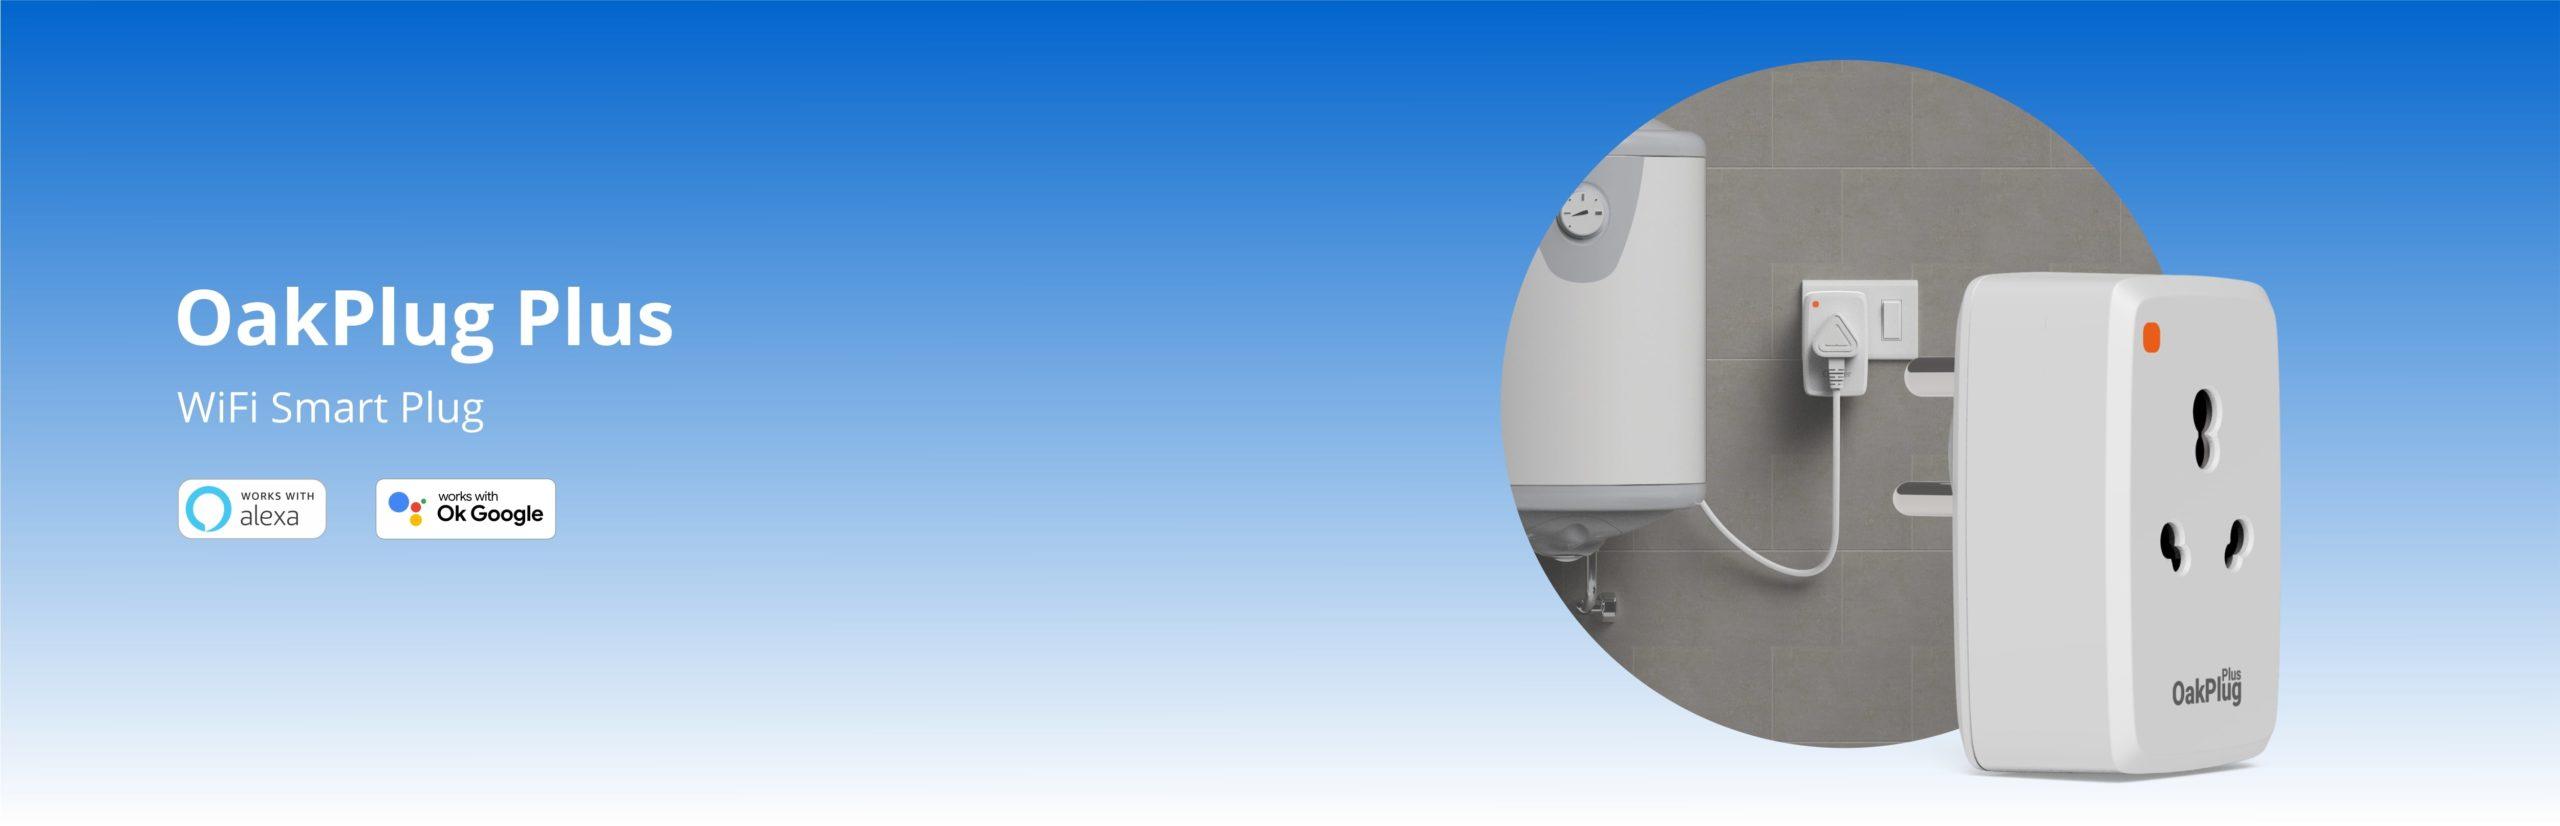 Oakplug-Plus- Wifi-Smart-Plug